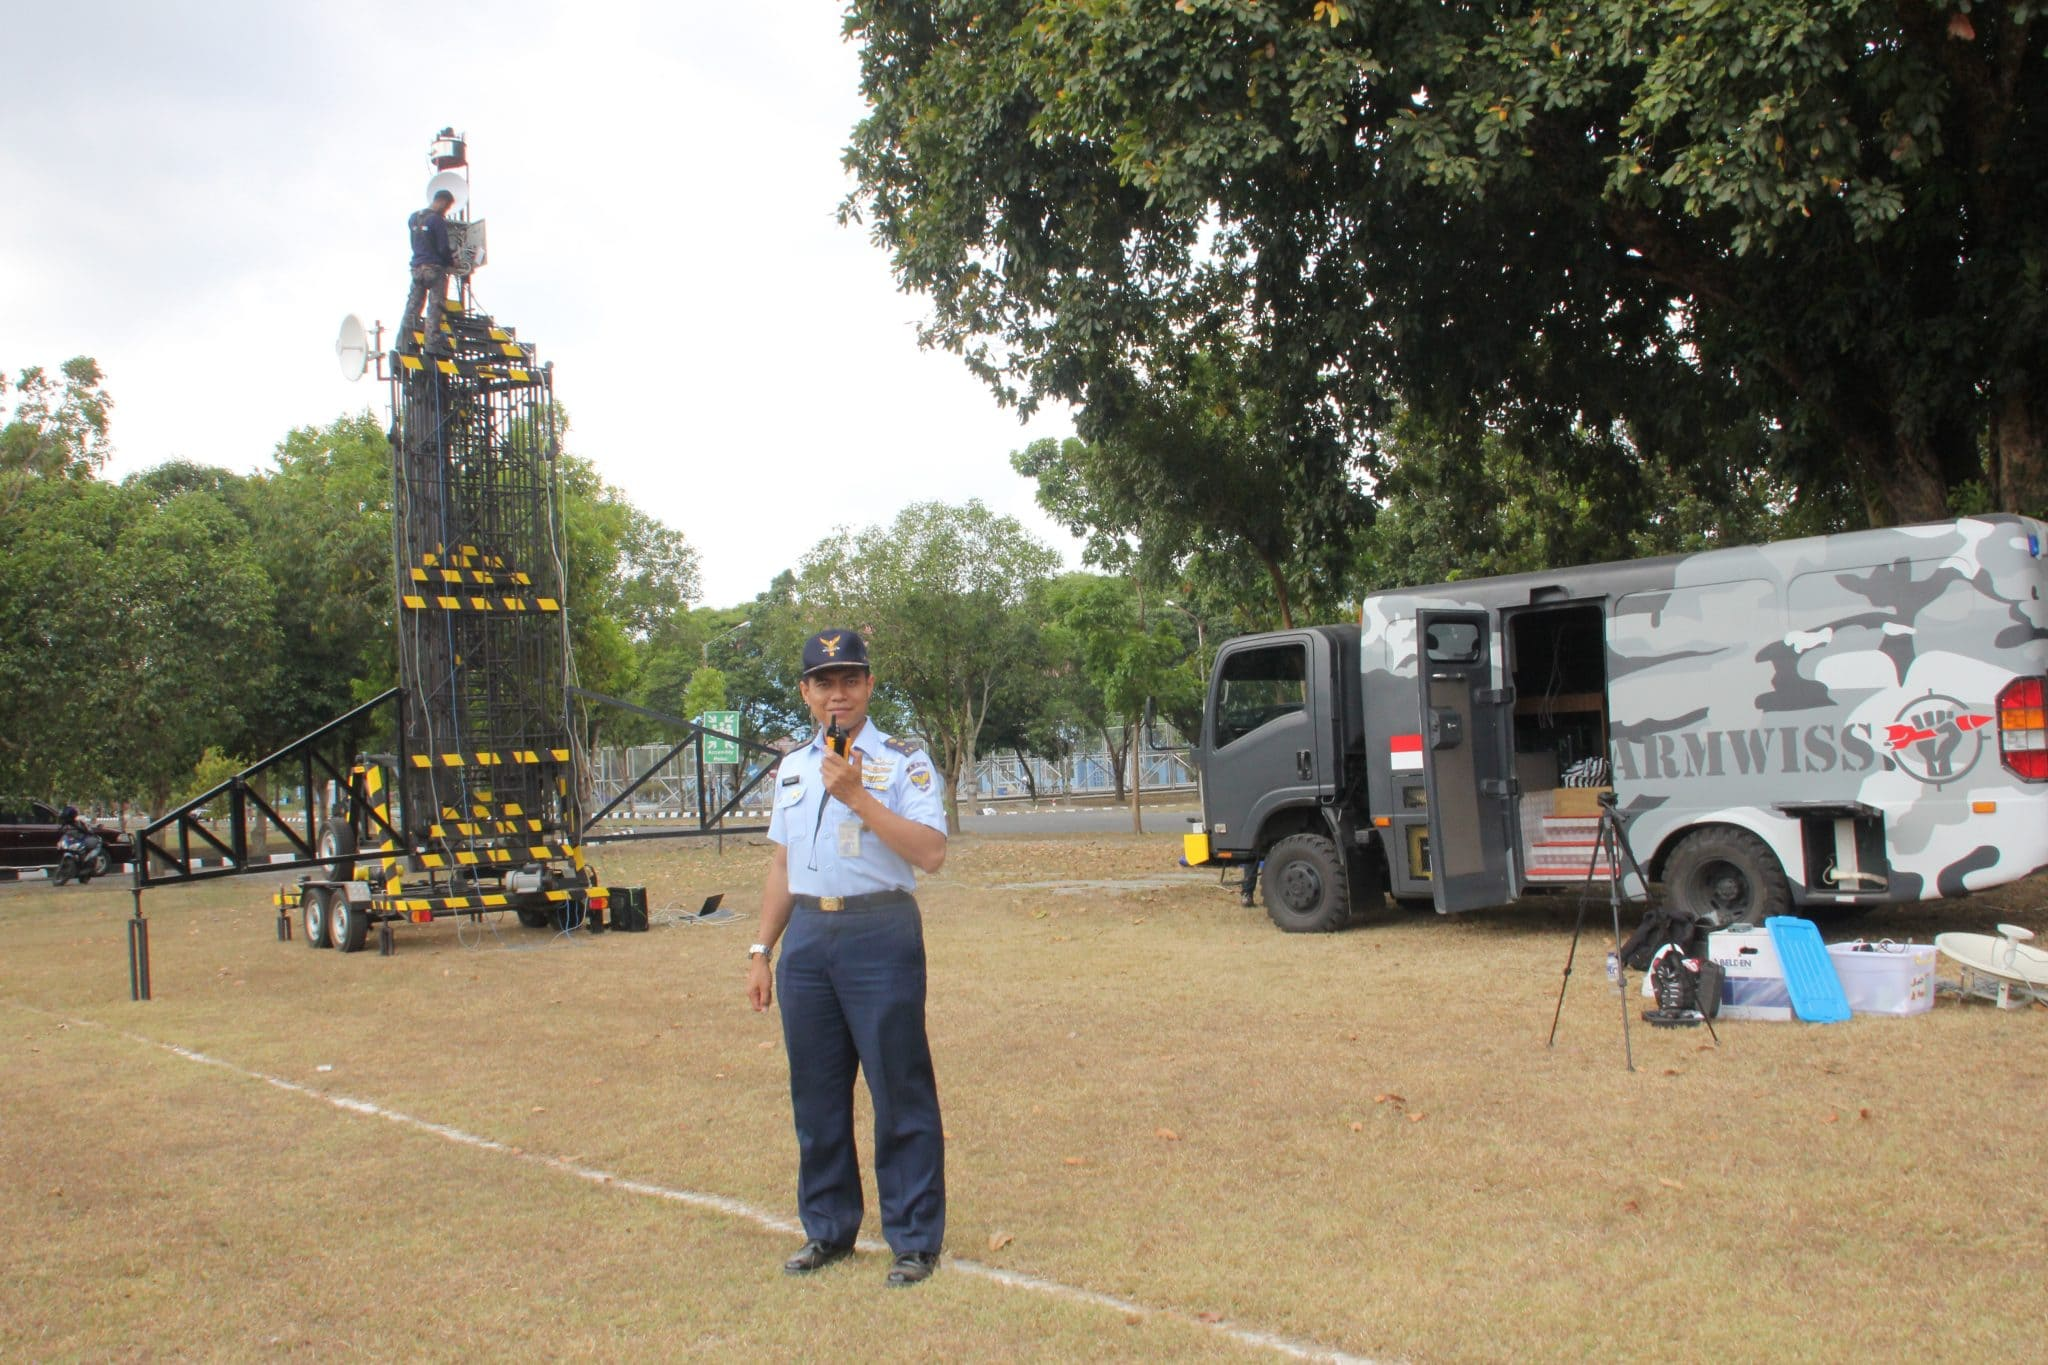 ARM WISS Hasil Riset Mayor Angkatan Udara : Ardian